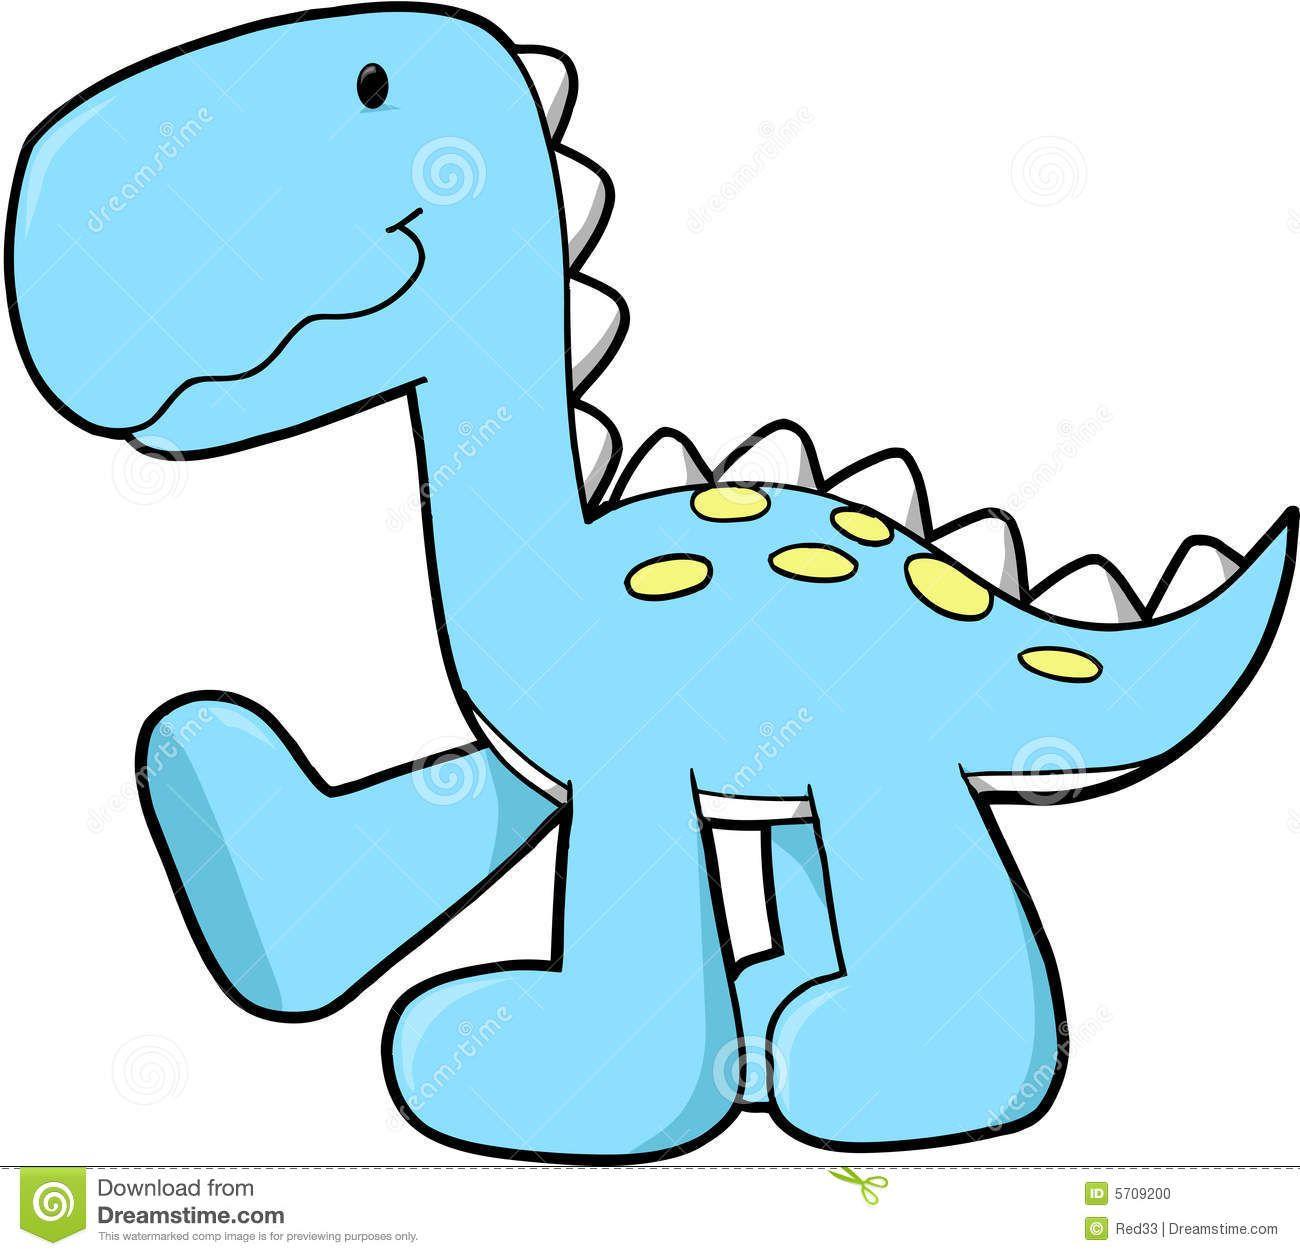 hight resolution of cute dinosaur free clipart